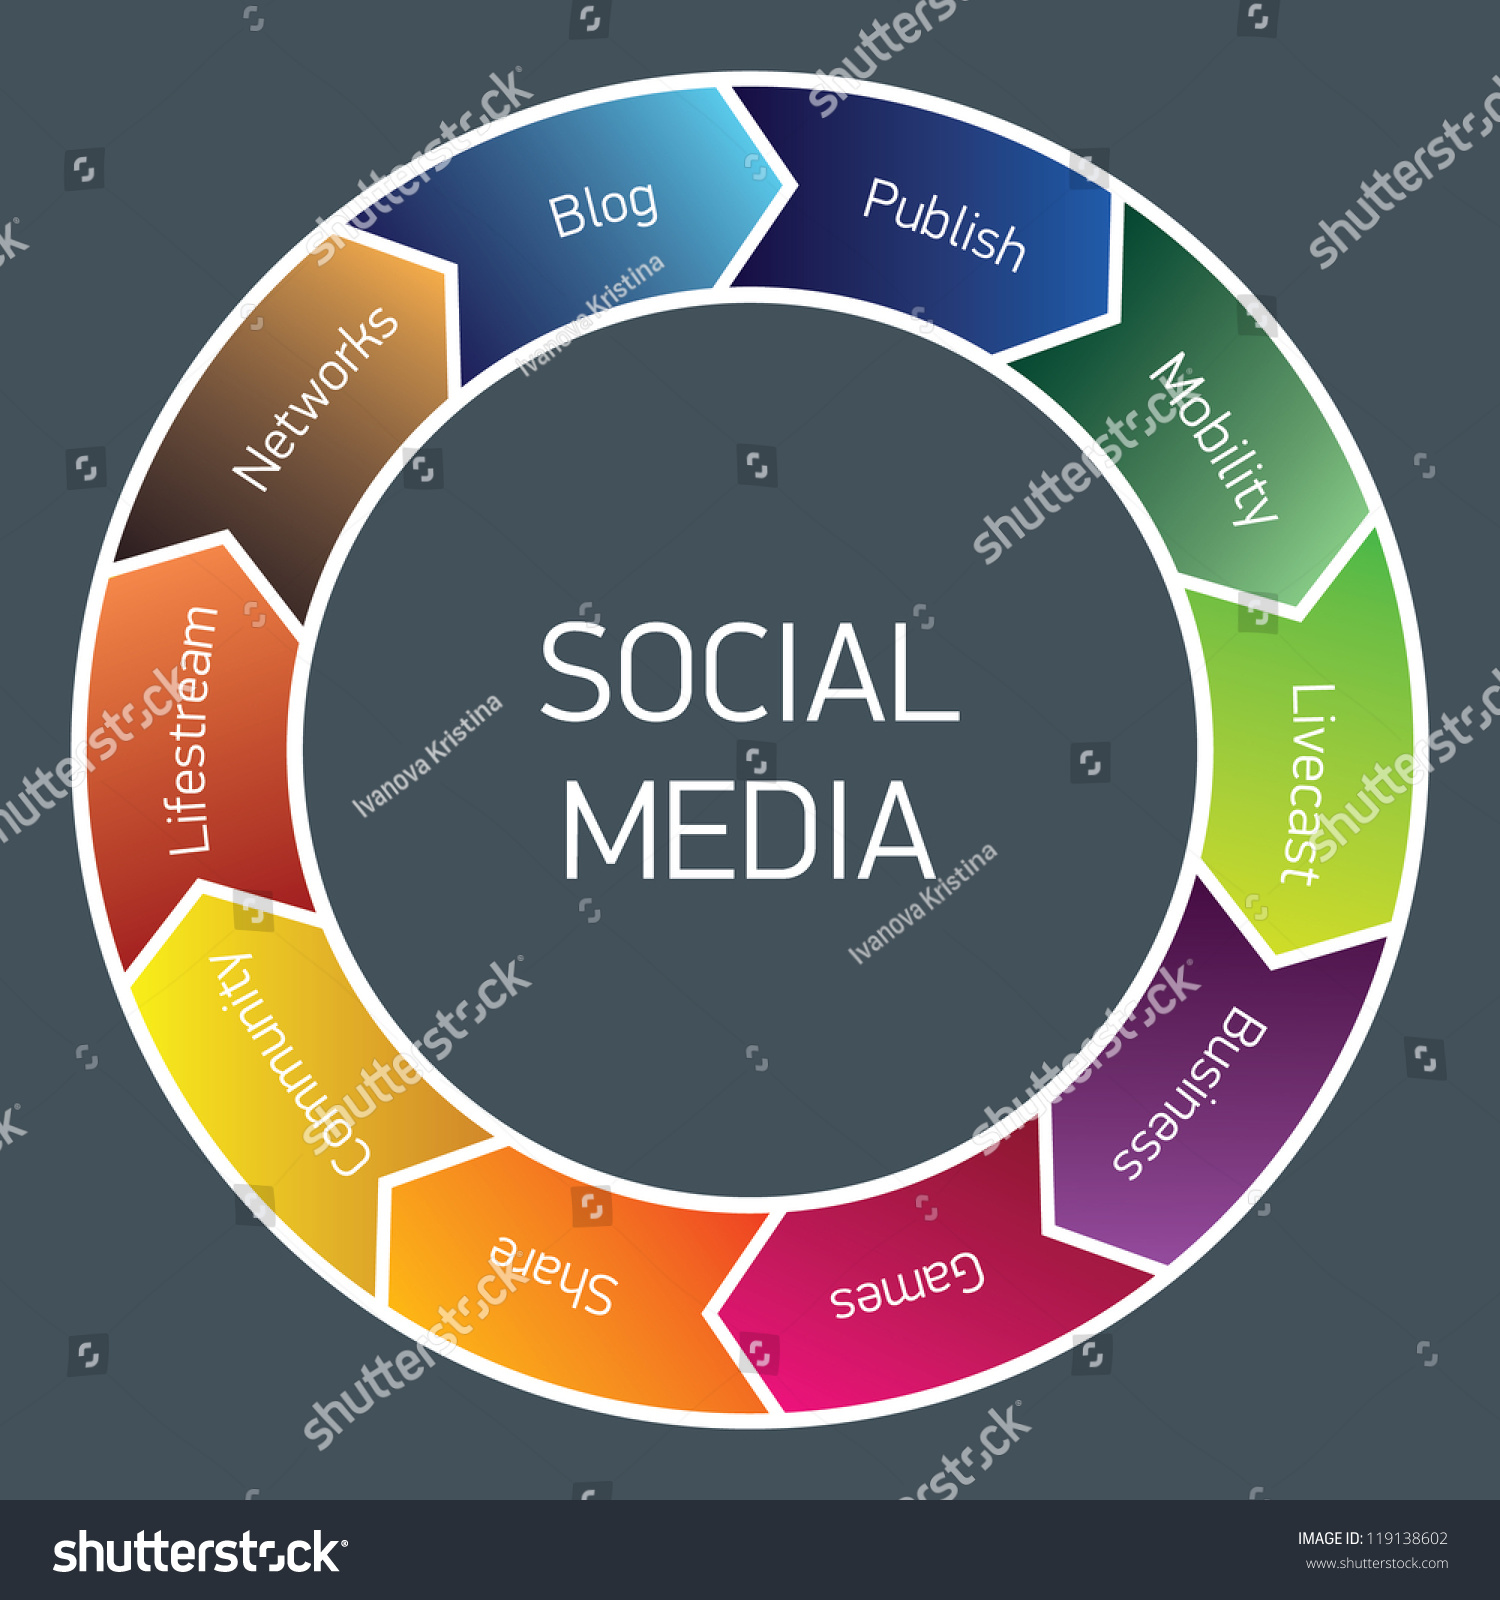 Vector Diagram Of Social Media